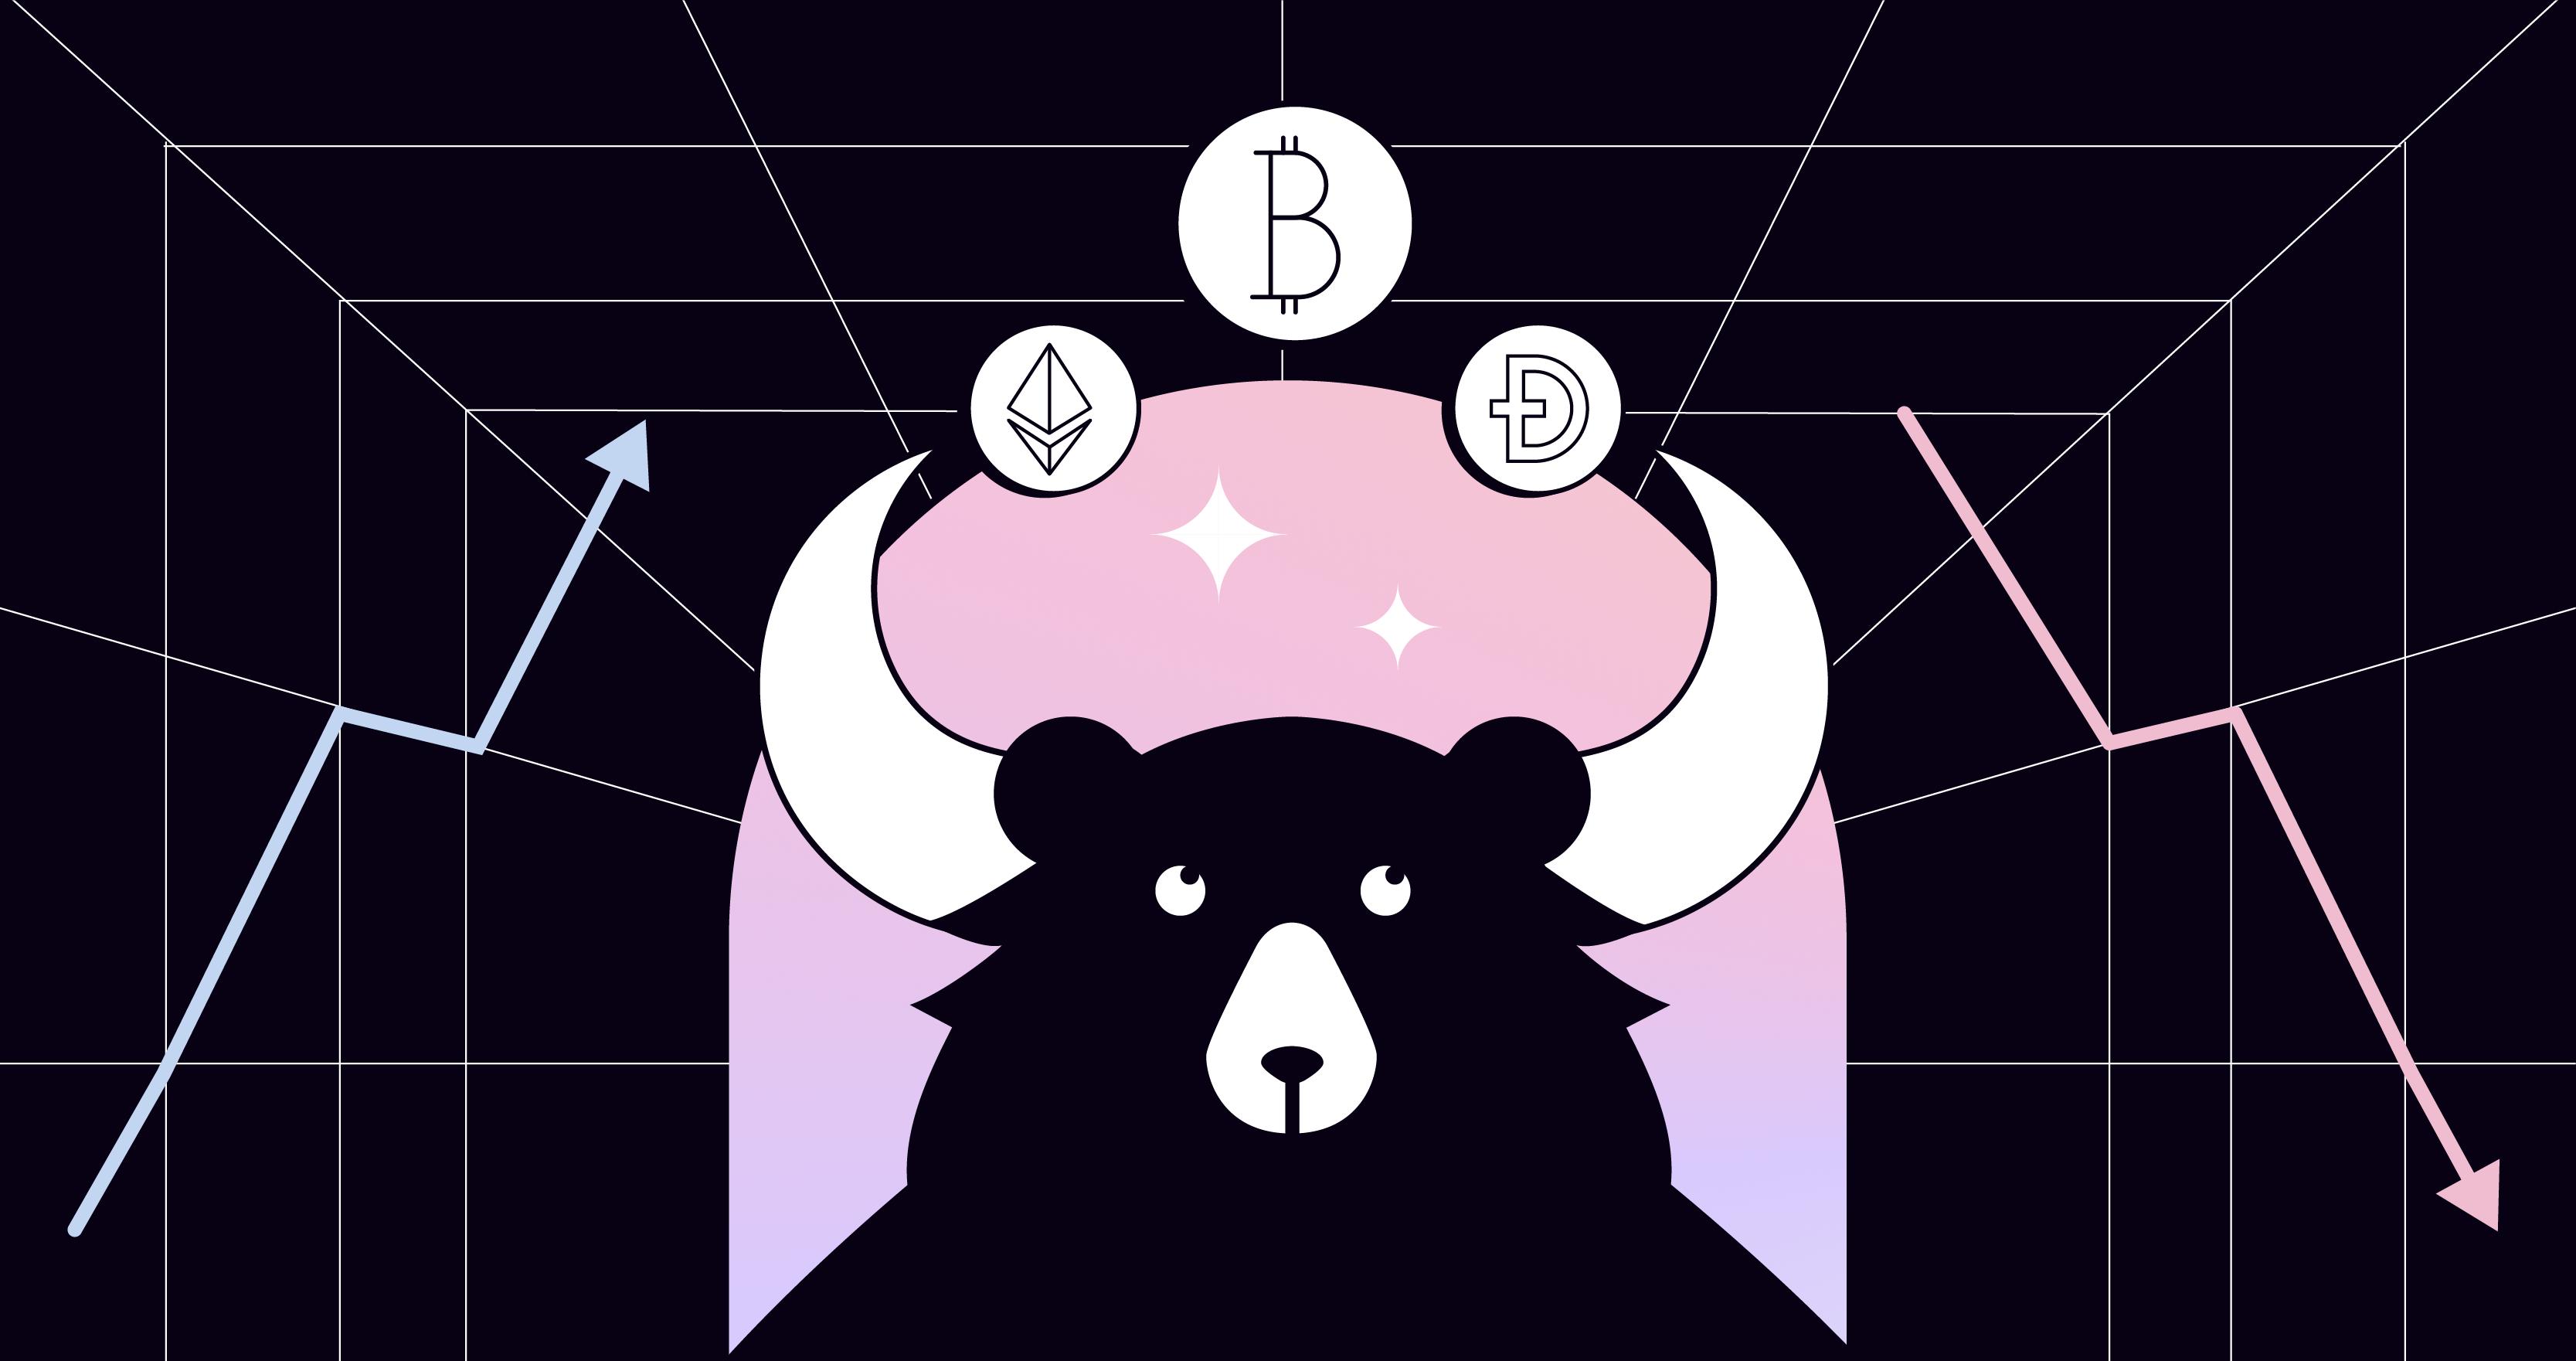 Bull and bear markets, explained